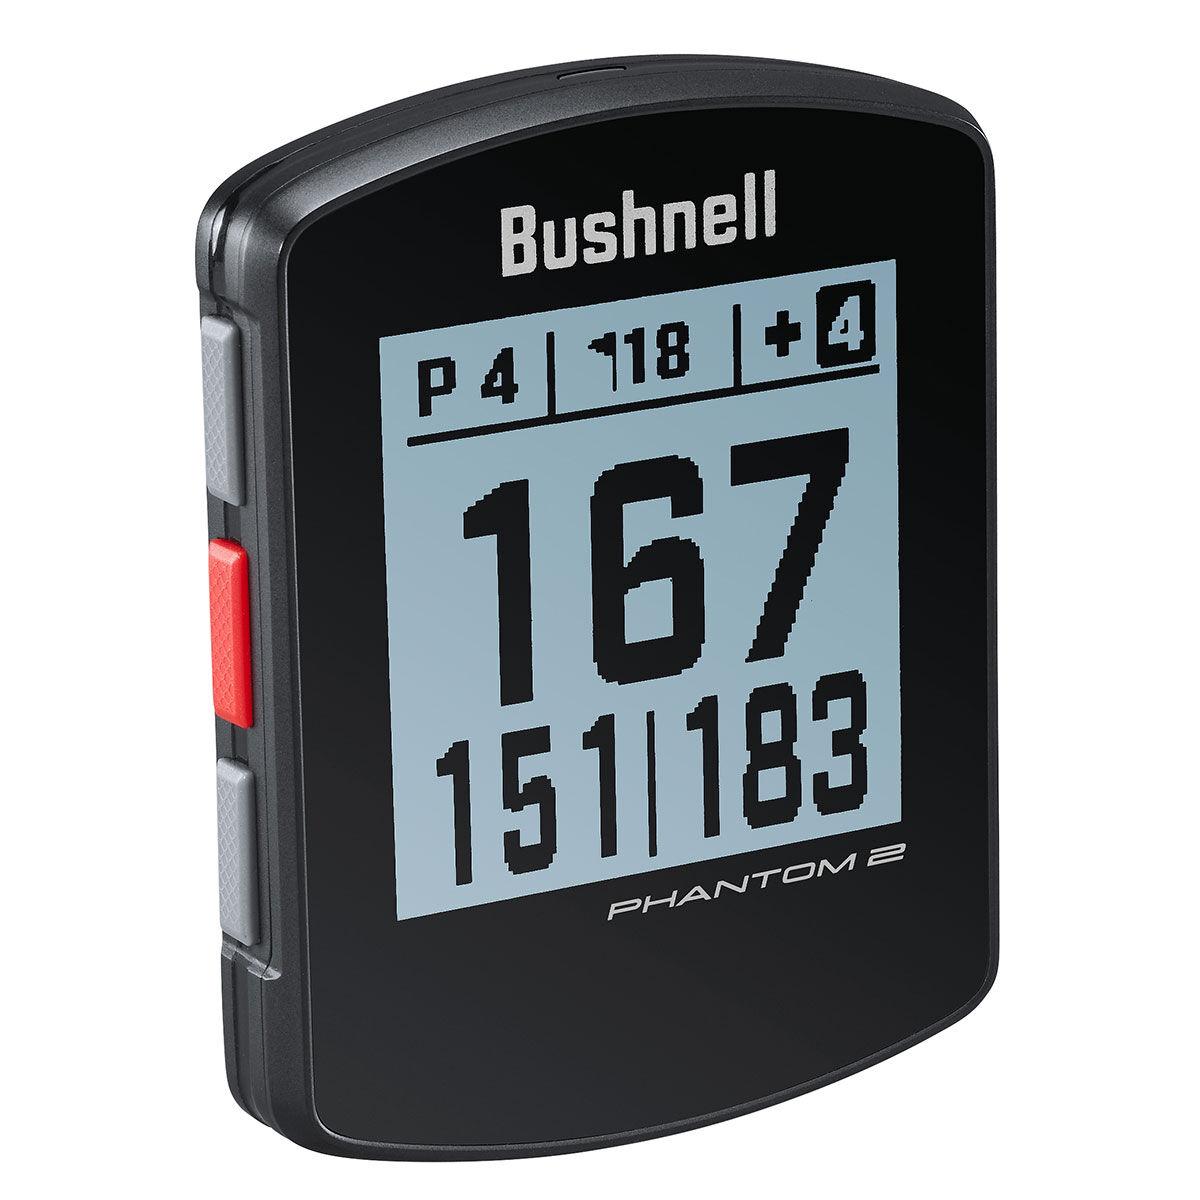 Bushnell Phantom 2 Handheld Golf GPS, Mens, Black, One Size | American Golf